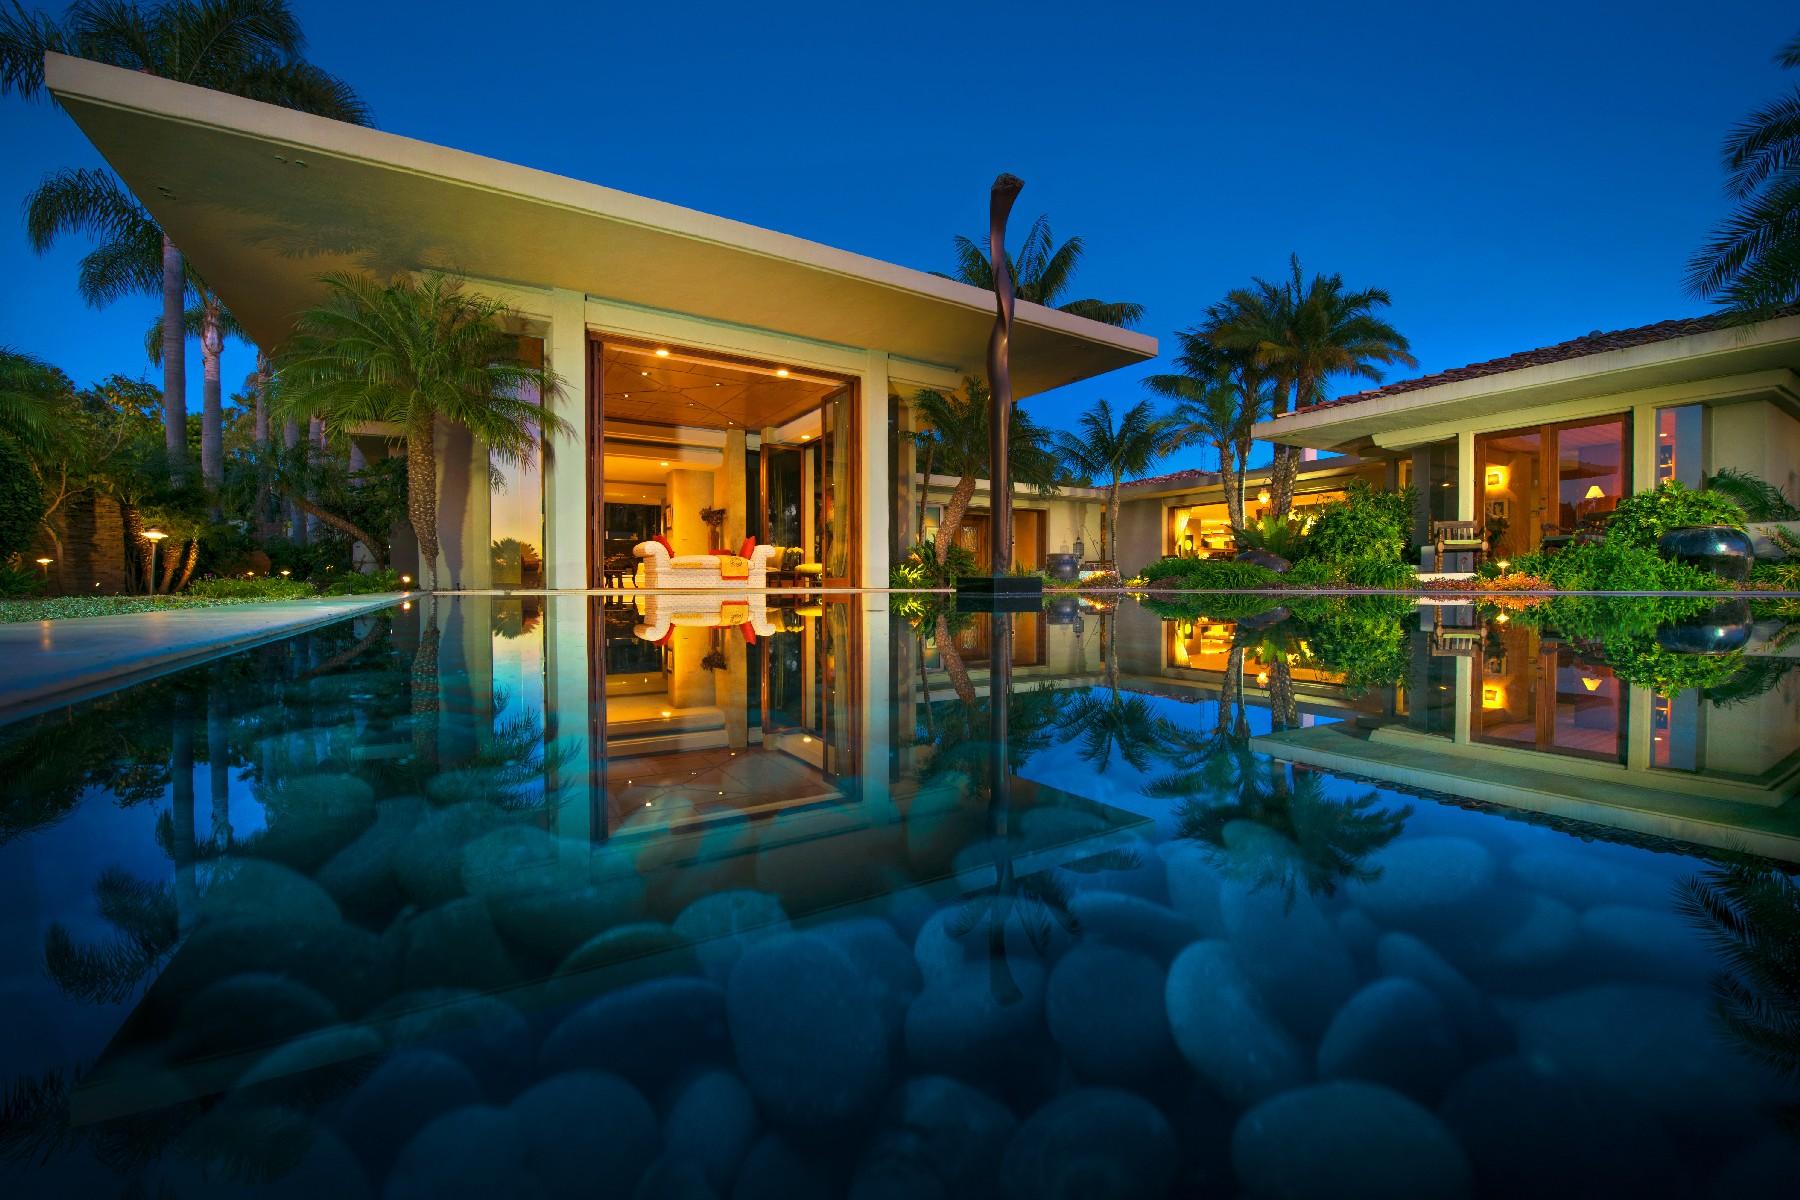 Single Family Home for Sale at 5979 Rancho Diegueno Rancho Santa Fe, California 92067 United States